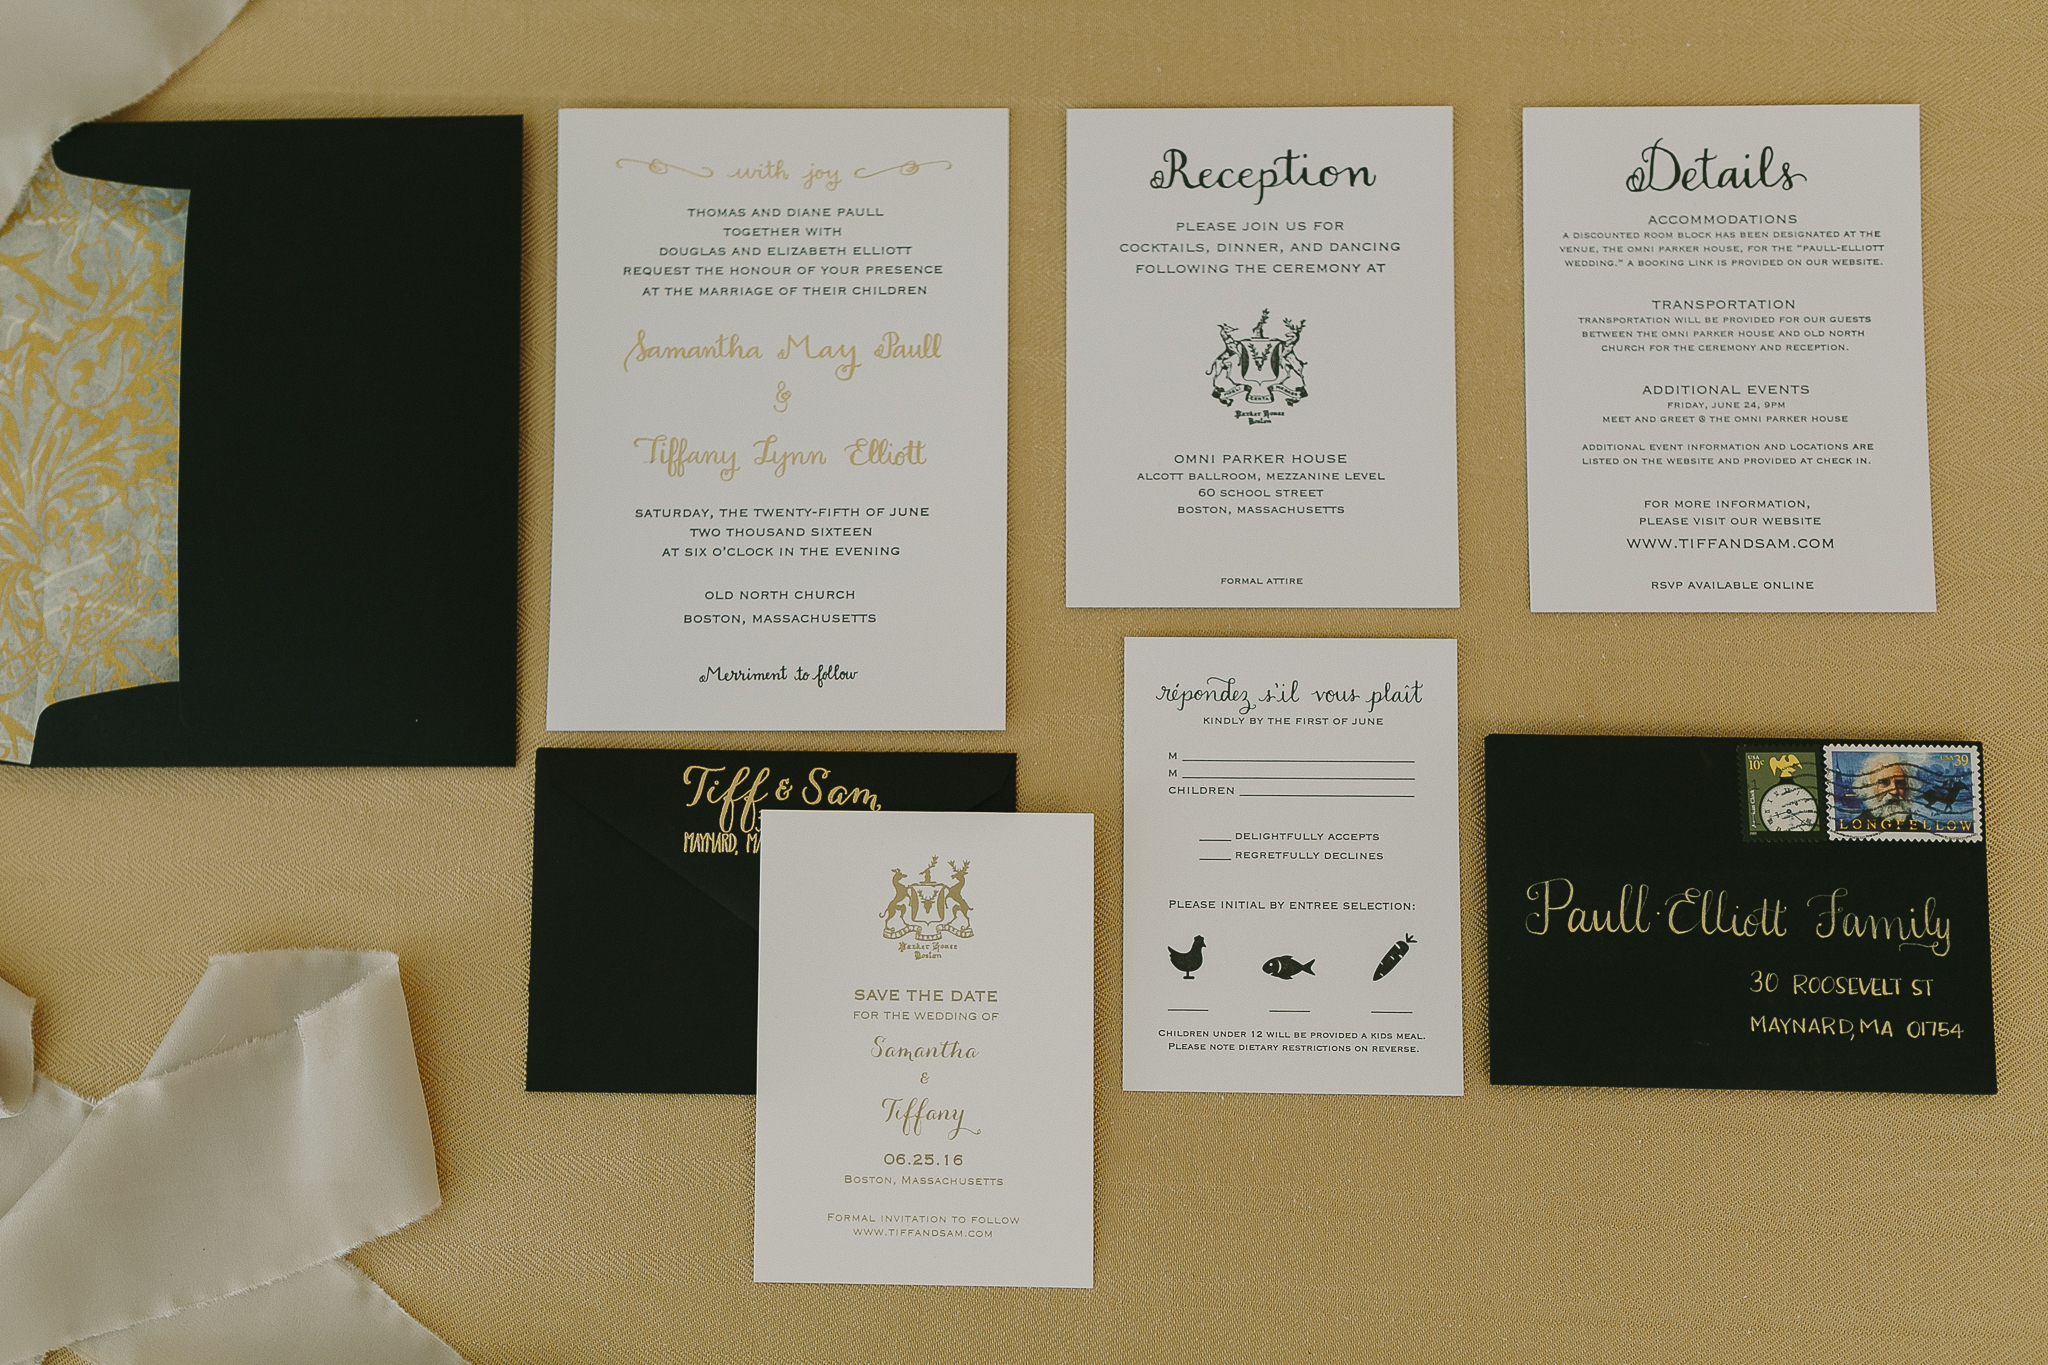 black tie wedding boston wedding invitation photo by siri jones